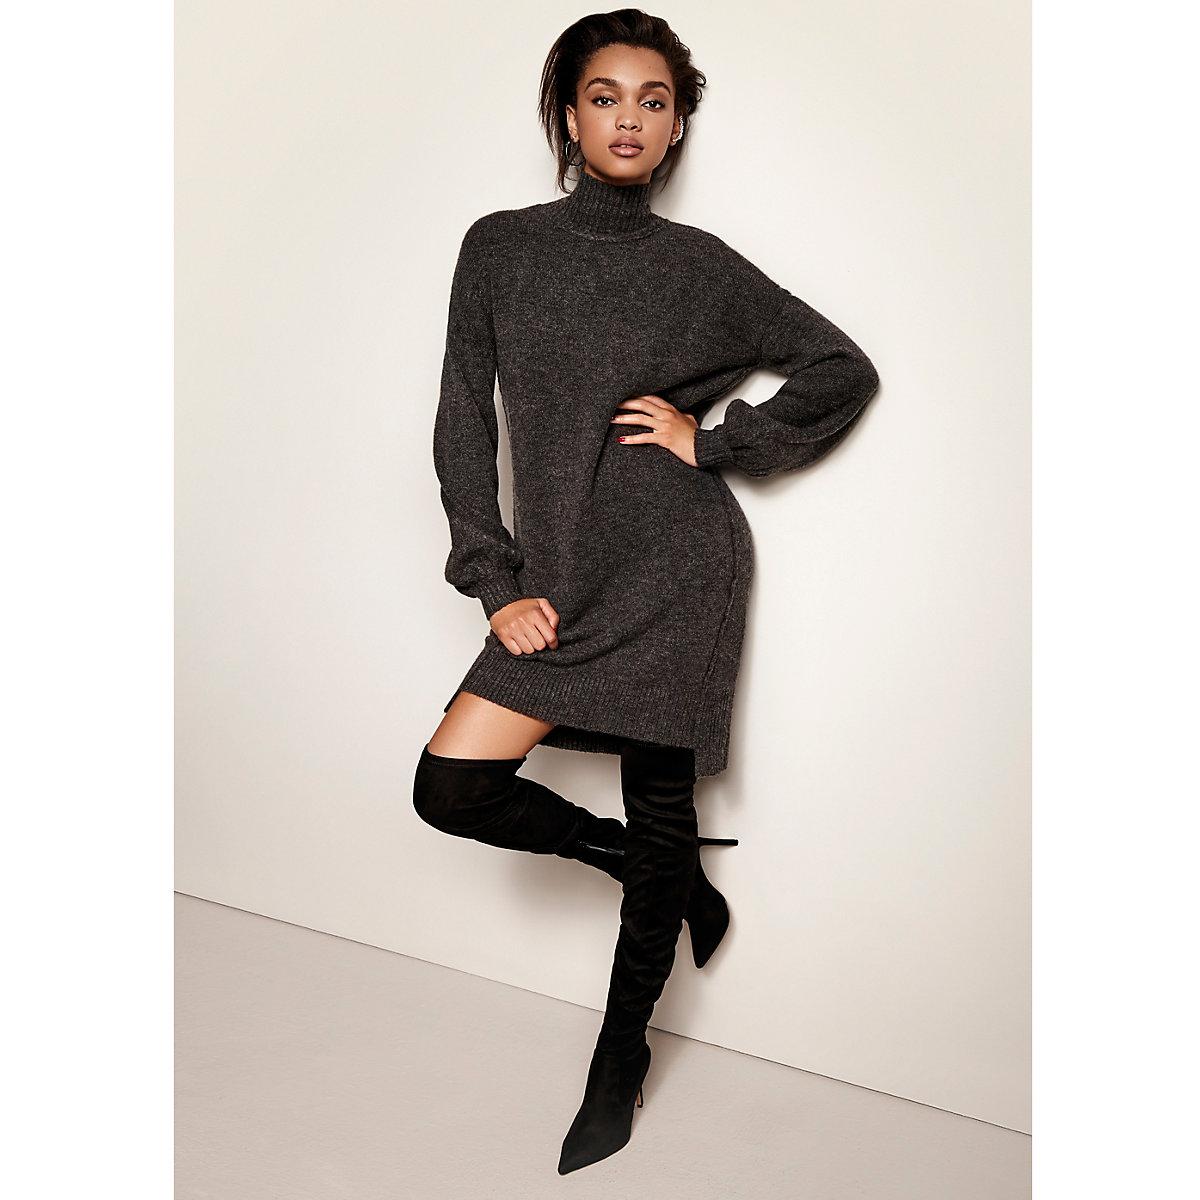 Dark grey knit balloon sleeve jumper dress